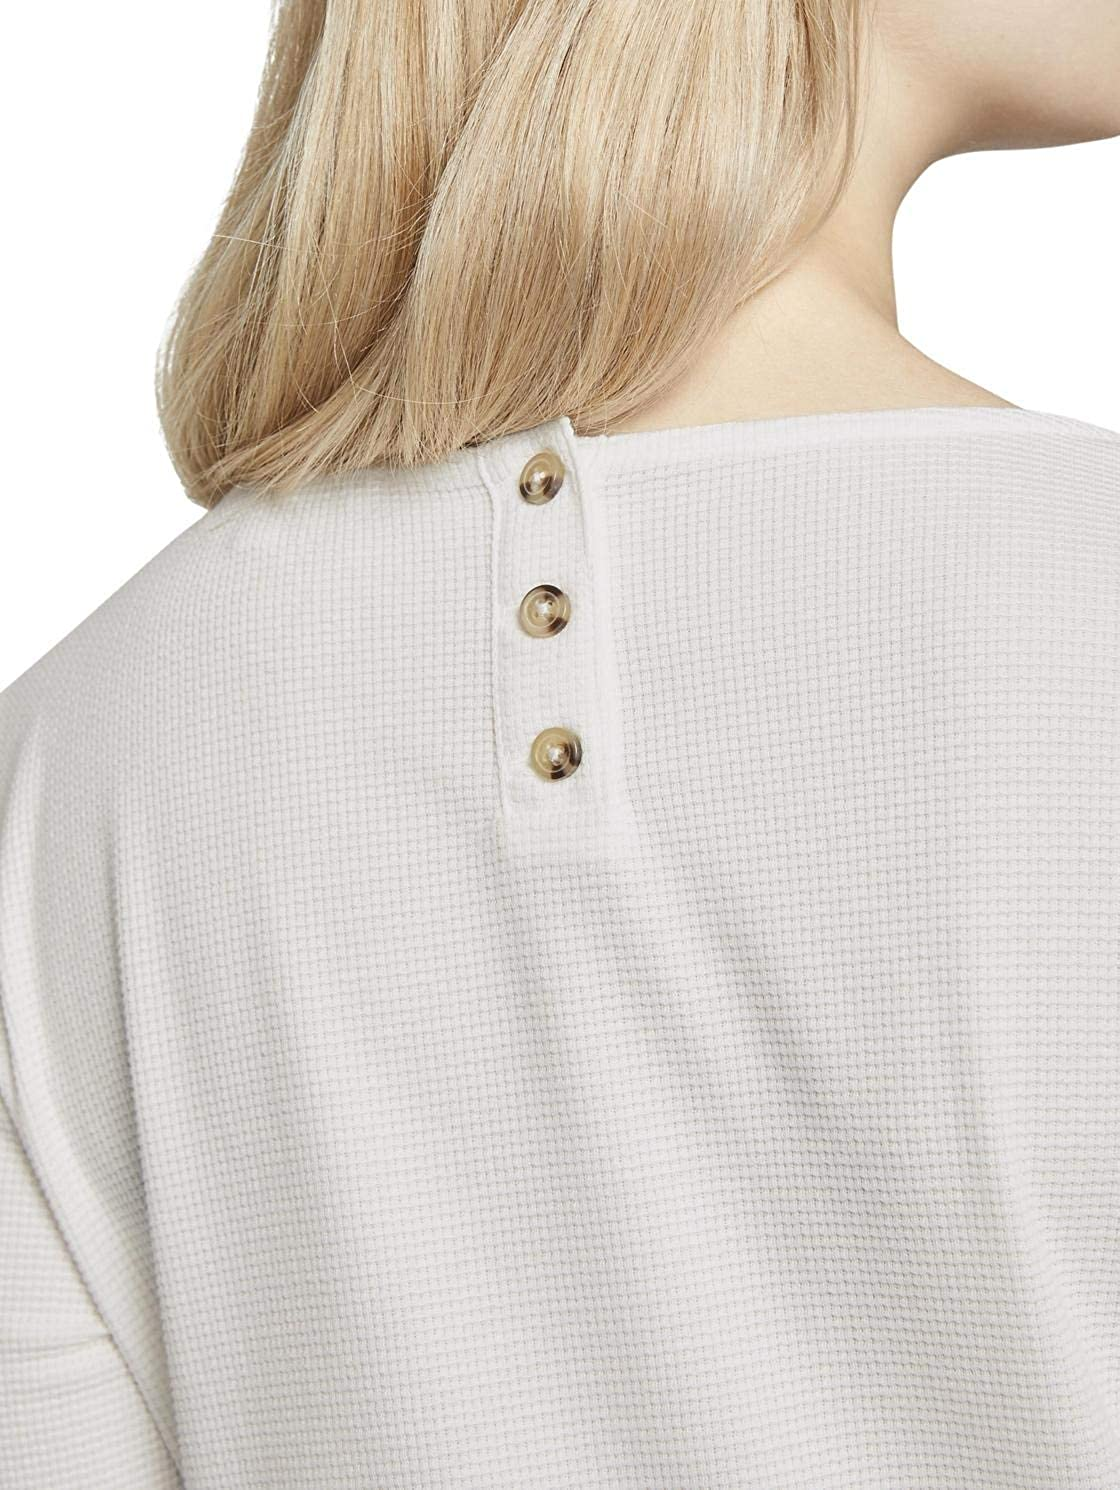 TOM TAILOR DENIM Damen Leichtes Strukturshirt Bluse